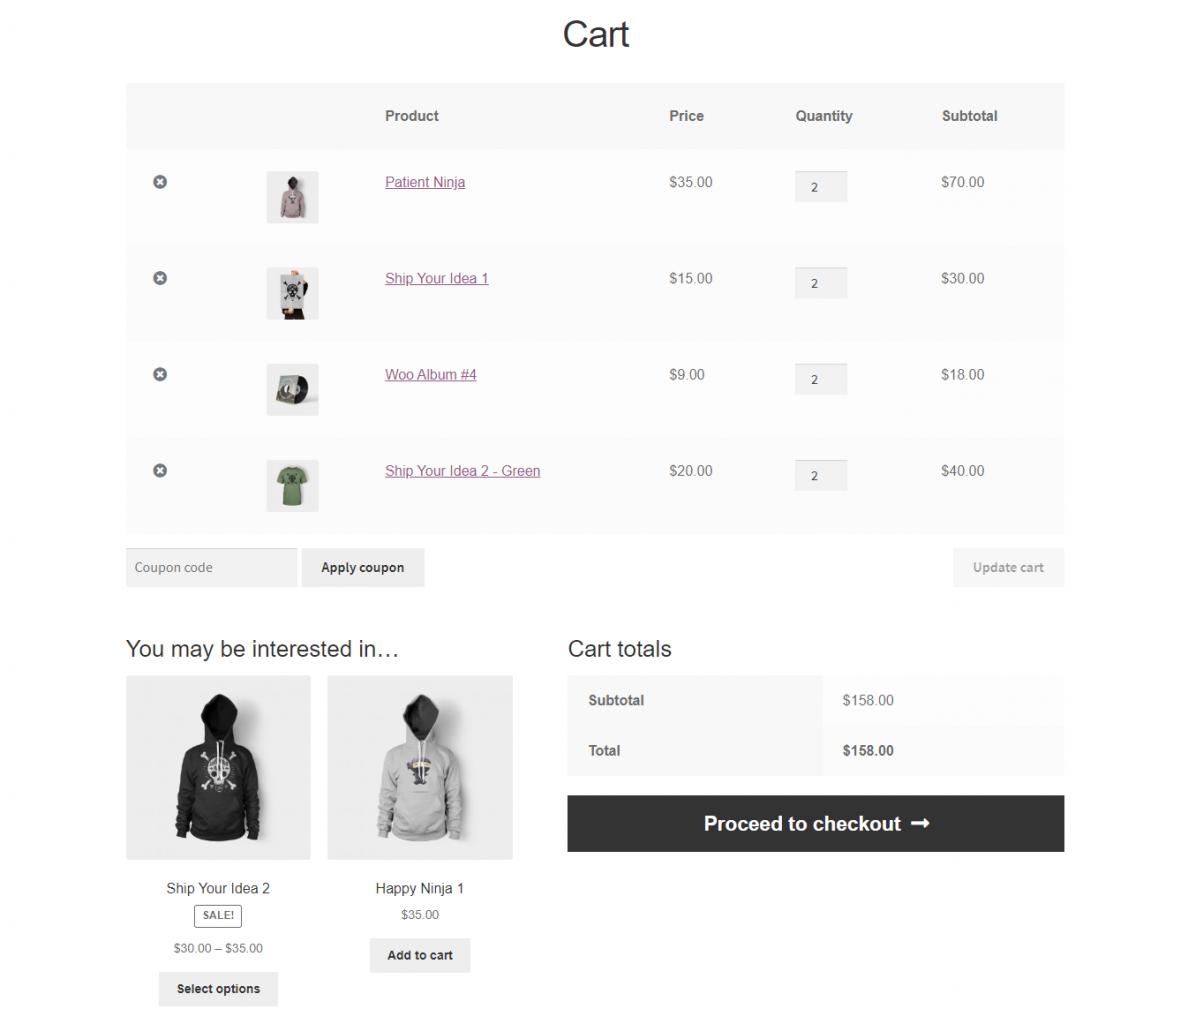 Webkul-WooCommerce-B2B-Marketplace-Quick-Order-Cart-View